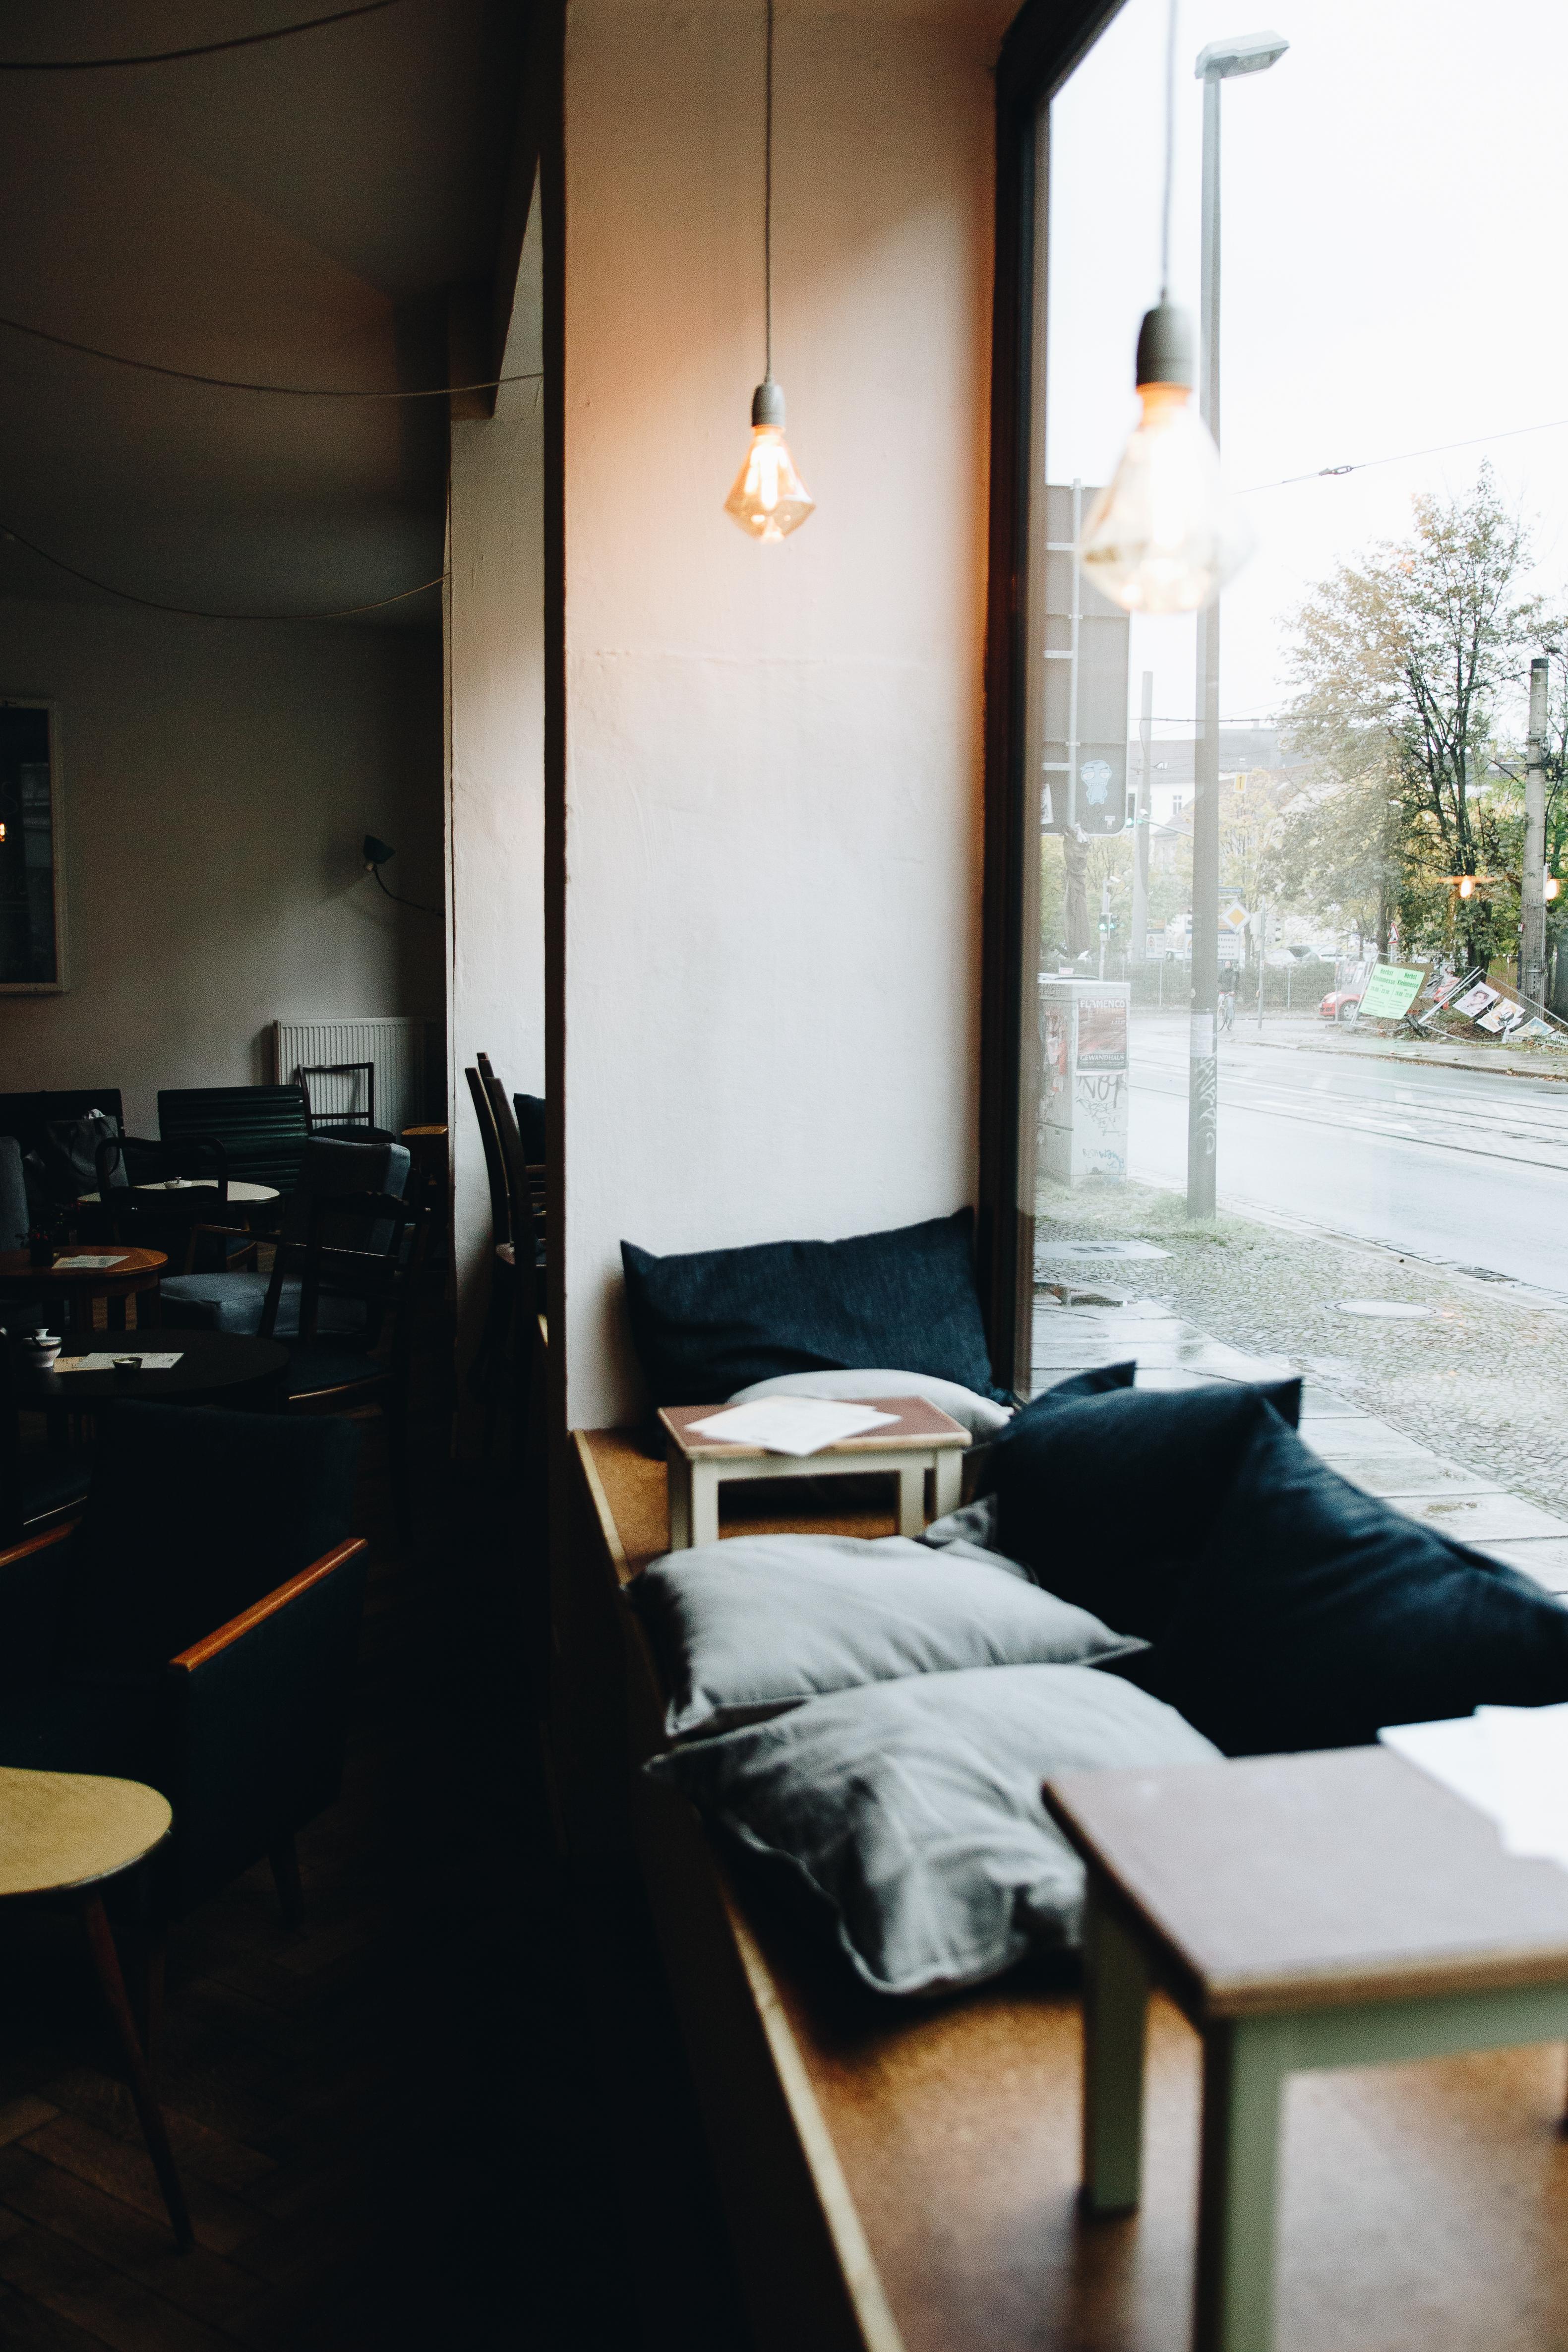 café ocka-lindenau-annabelle sagt-leipzig8